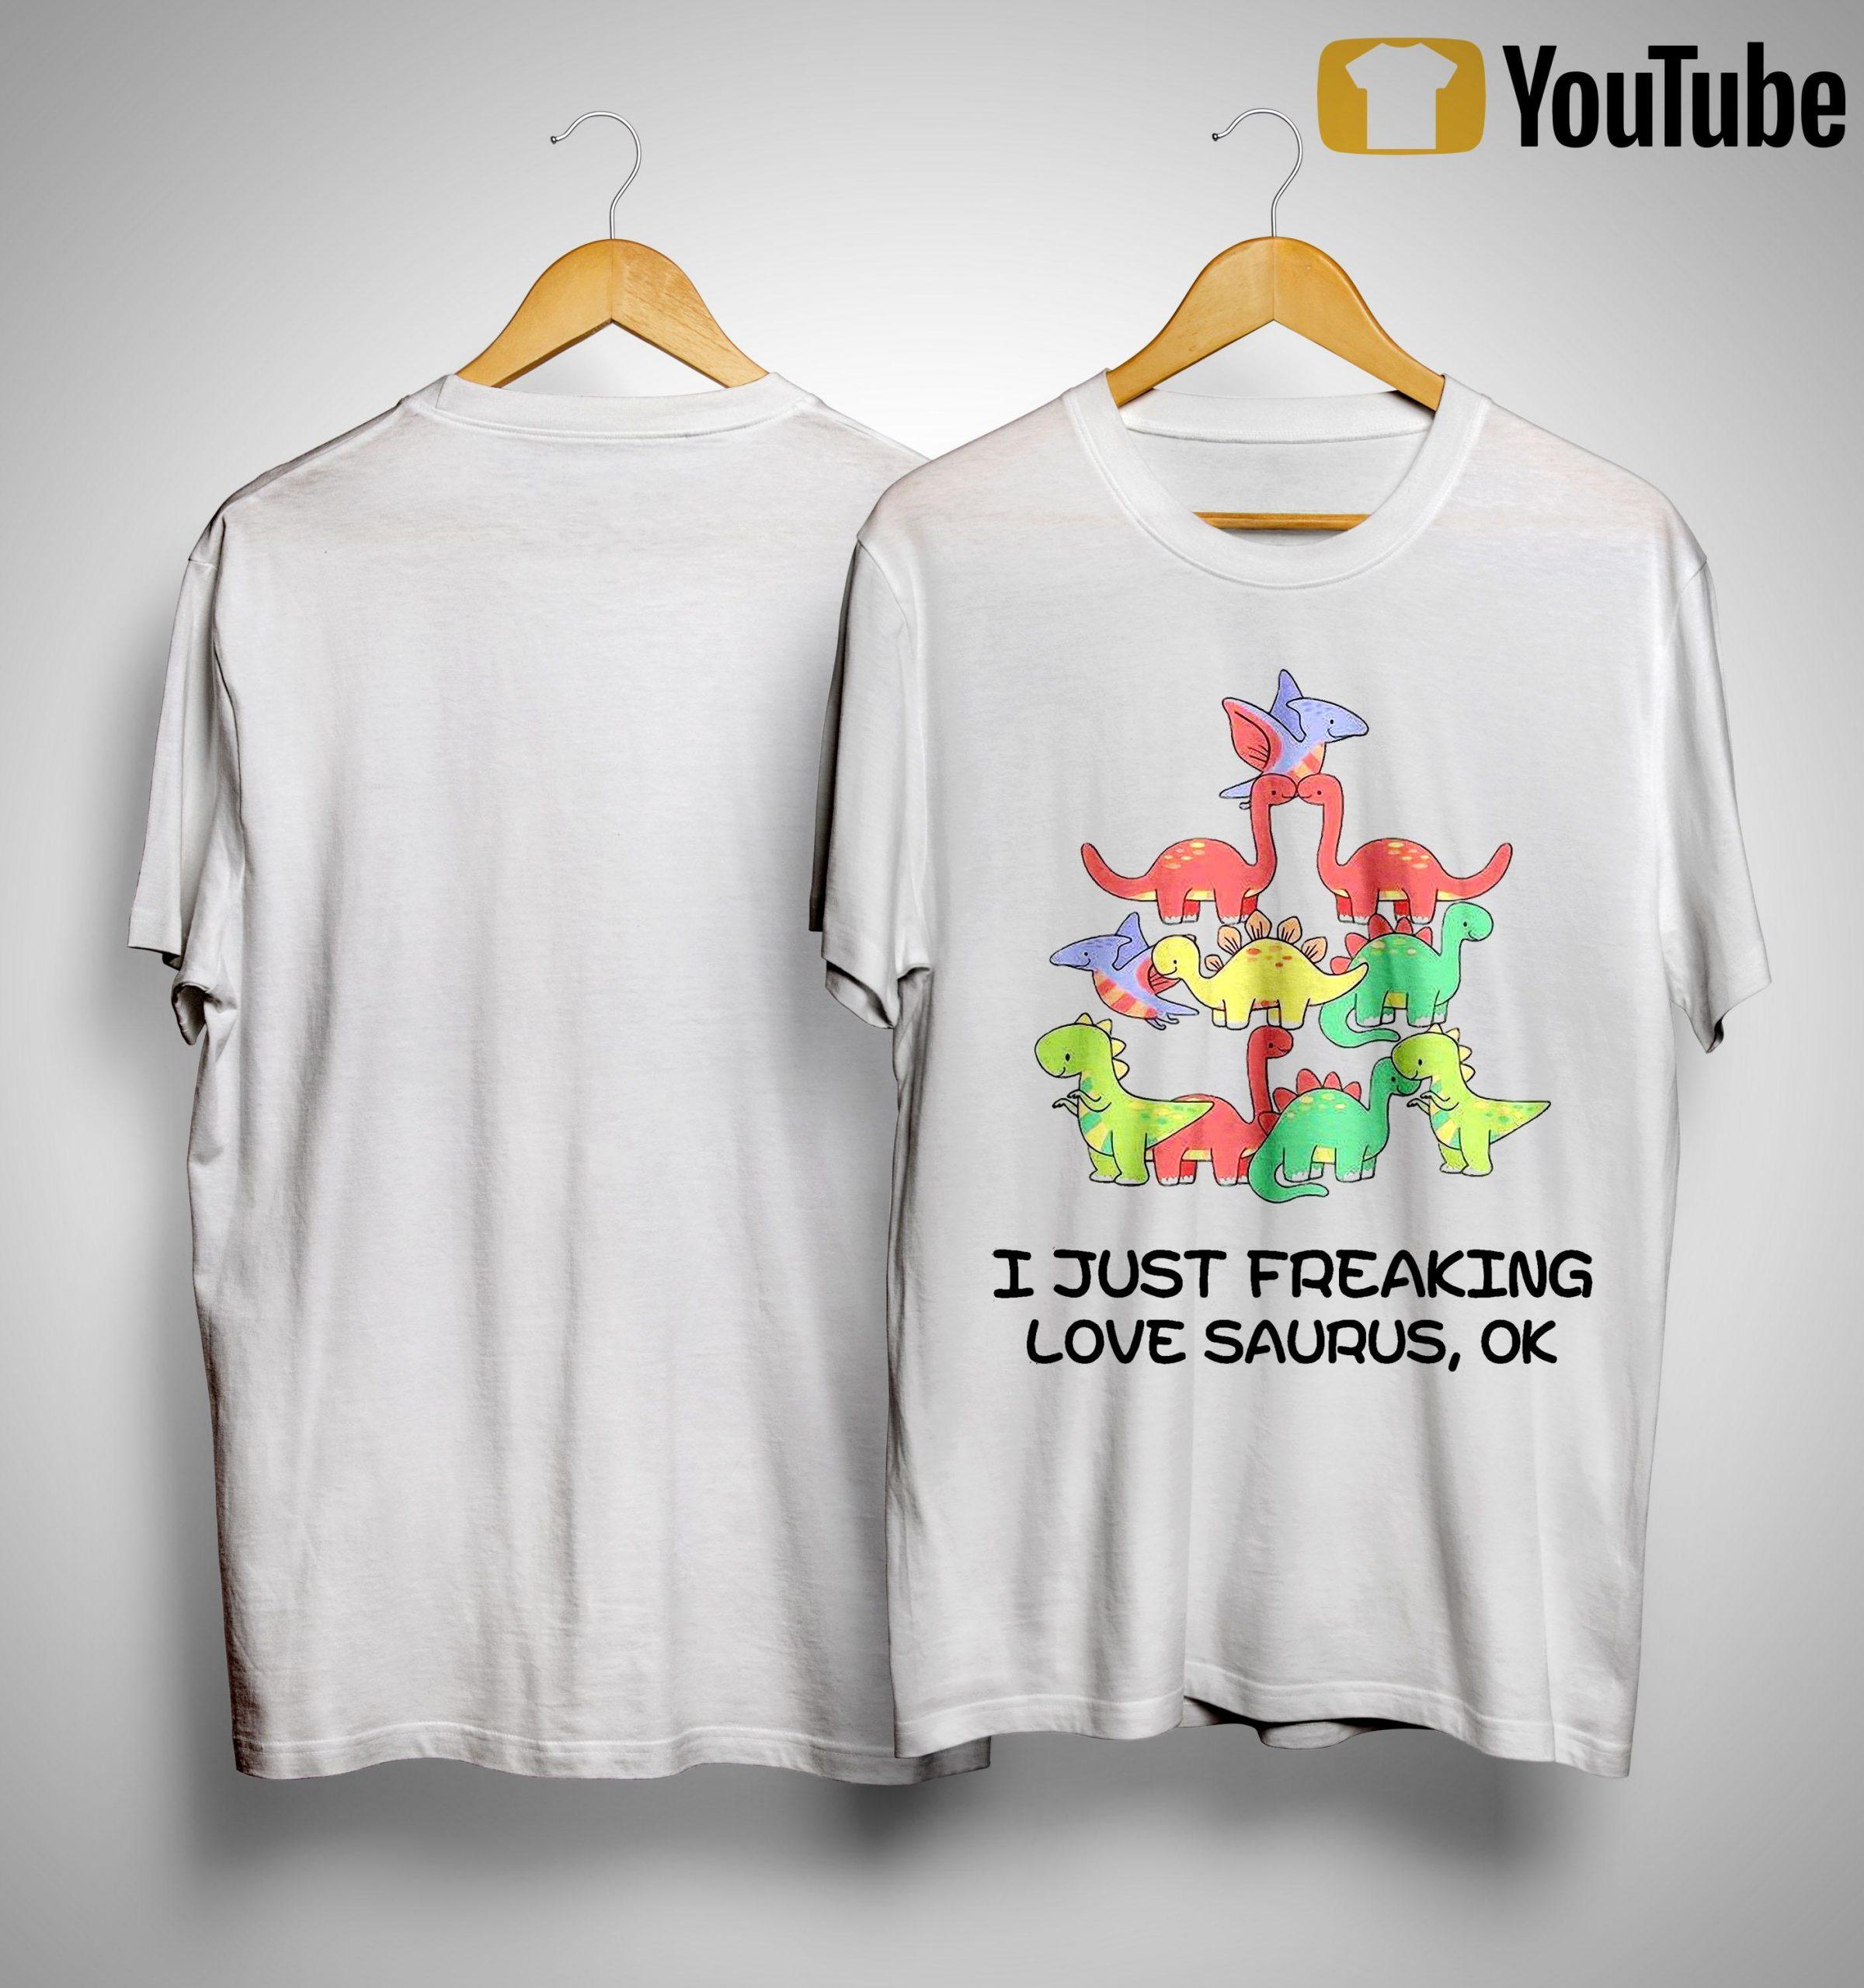 I Just Freaking Love Saurus Ok Shirt